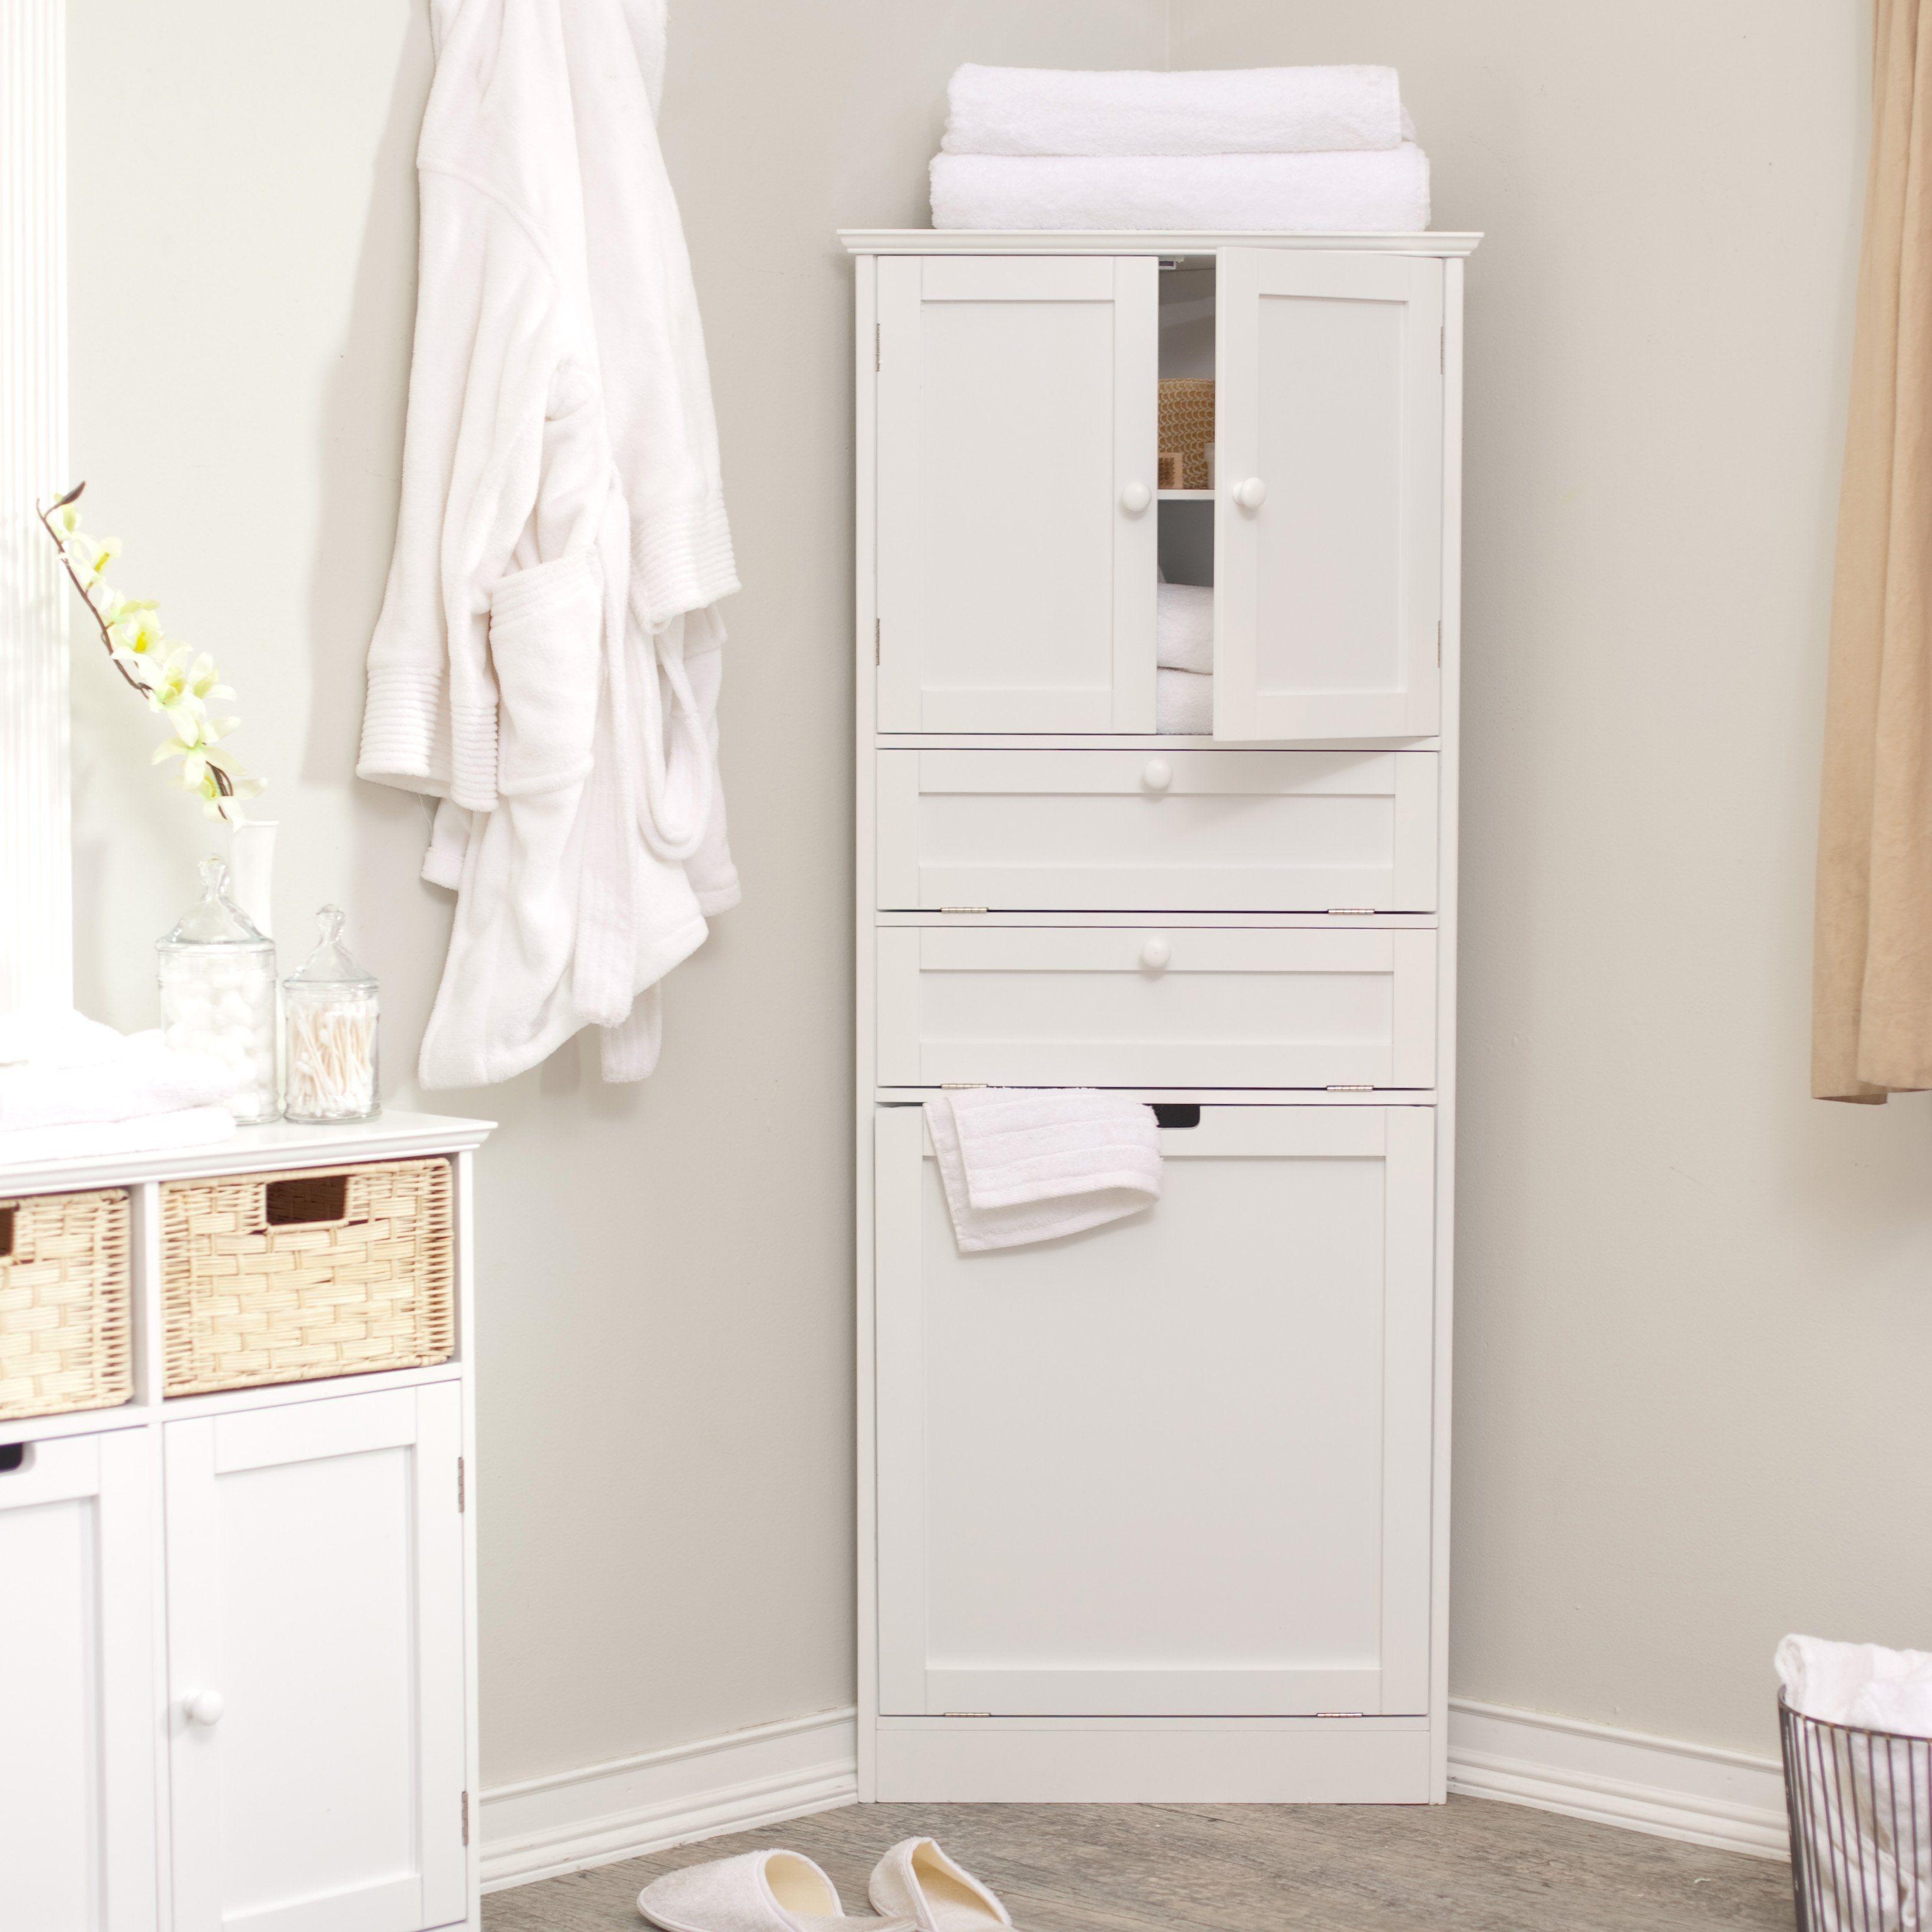 Small Corner Bathroom Storage Cabinet Bathrooms Remodel In within measurements 3279 X 3279